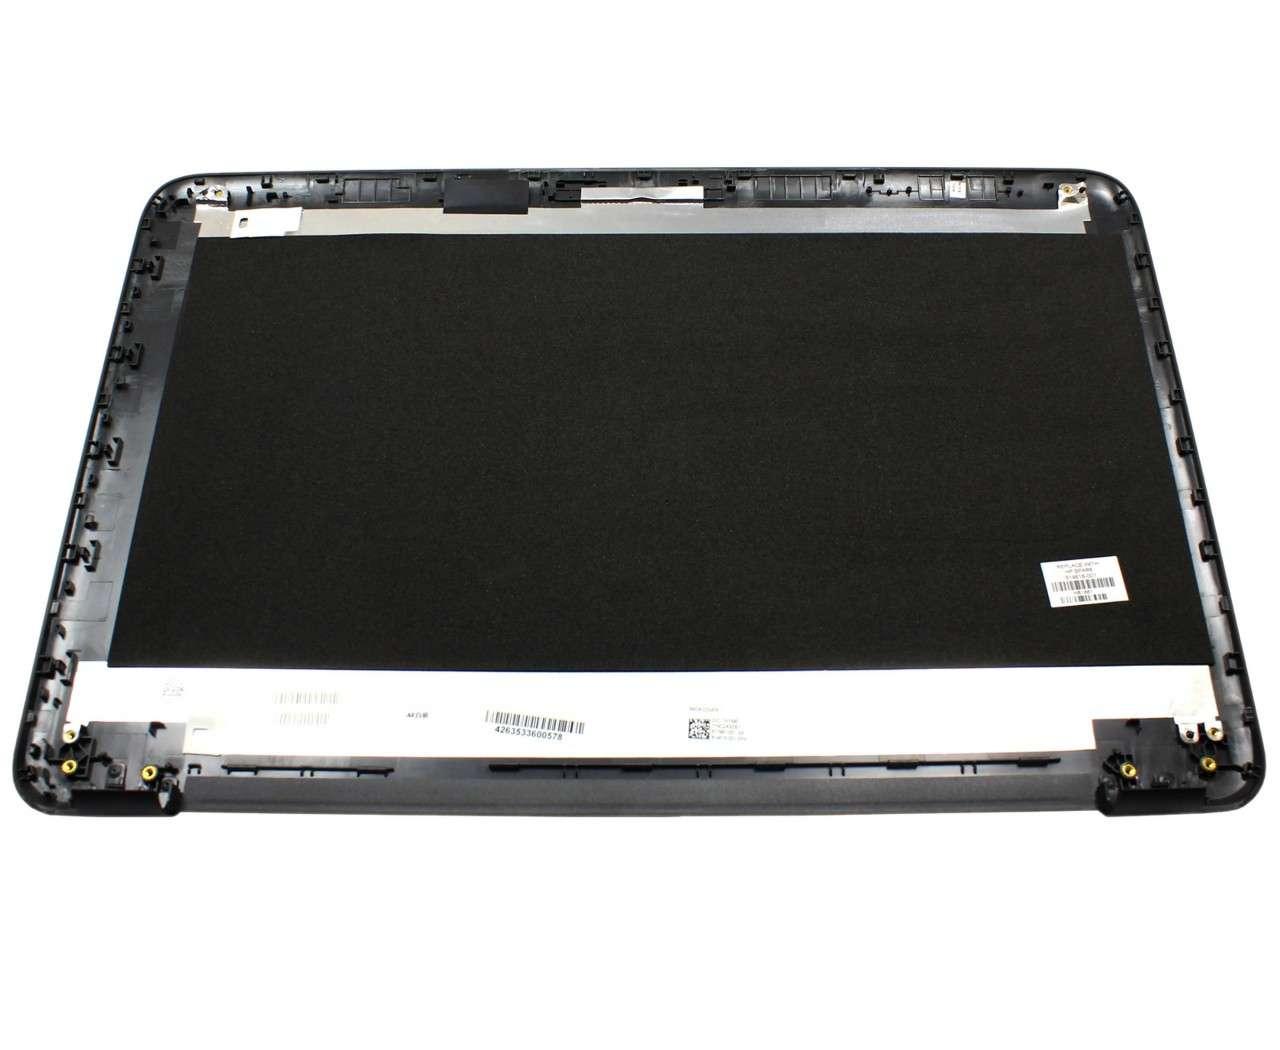 Capac Display BackCover HP 859511 001 Carcasa Display imagine powerlaptop.ro 2021